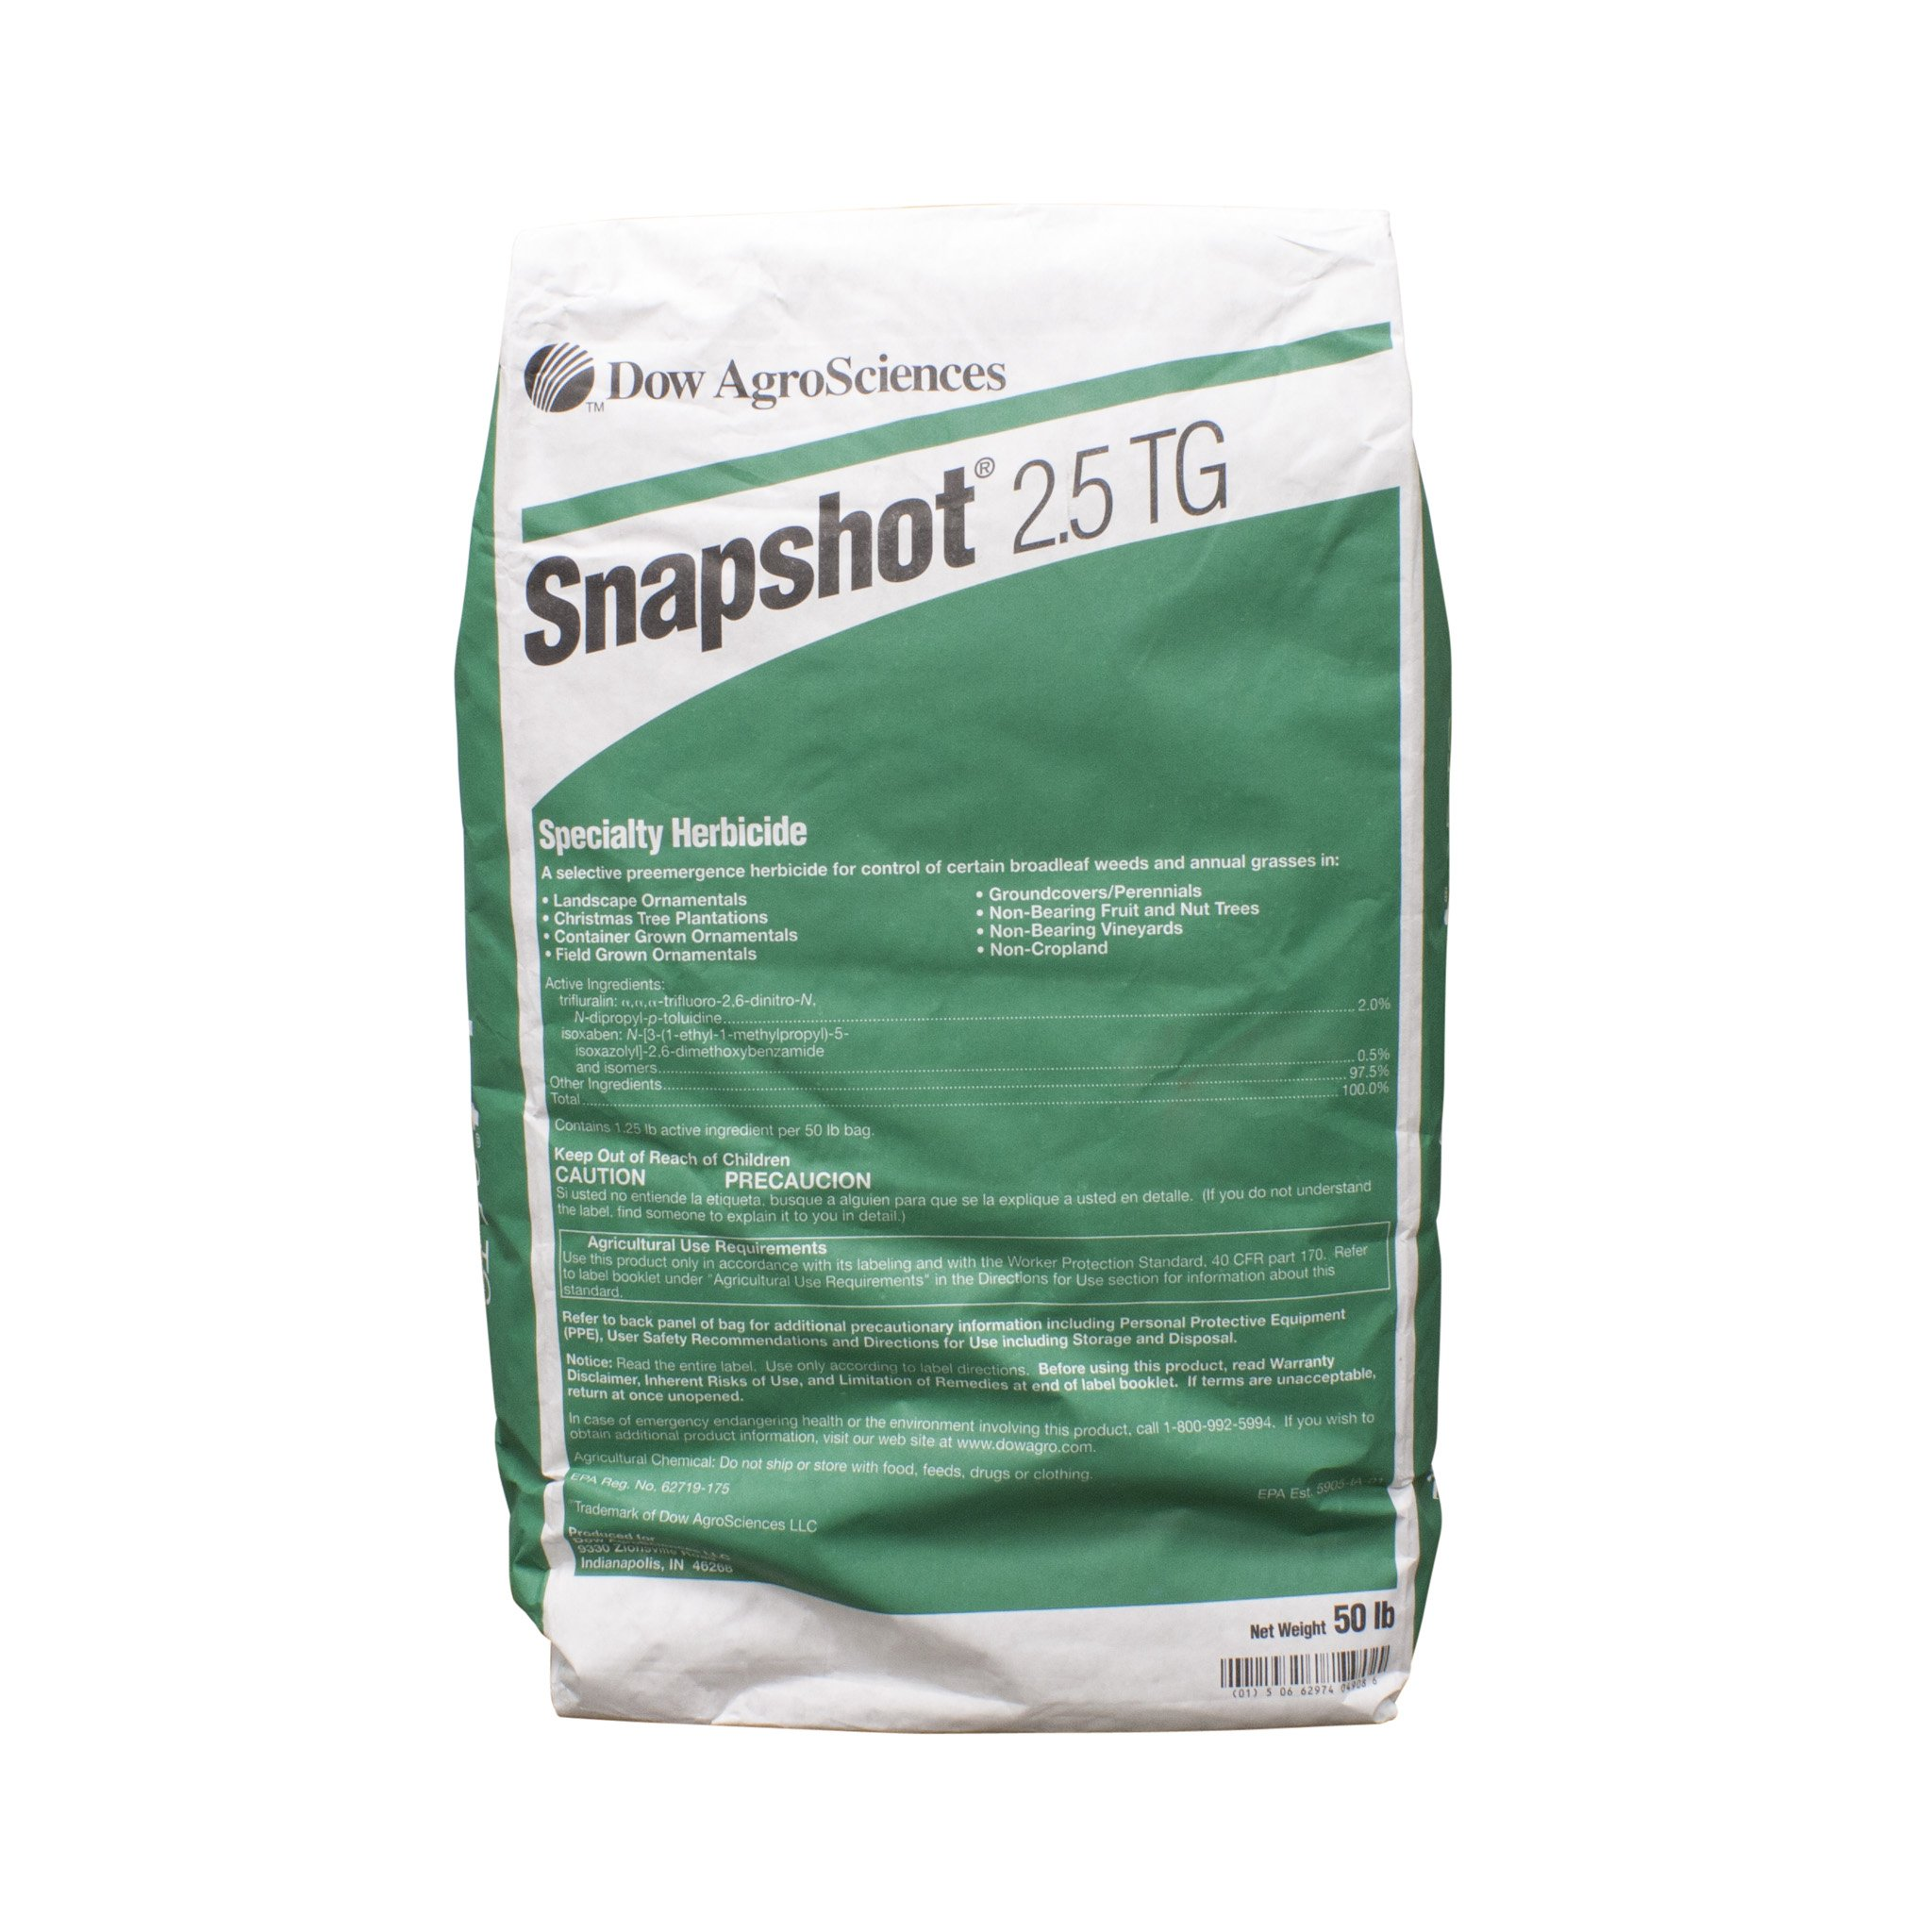 Snapshot 2.5 TG Granular Pre-emergent Herbicide by A.M. Leonard